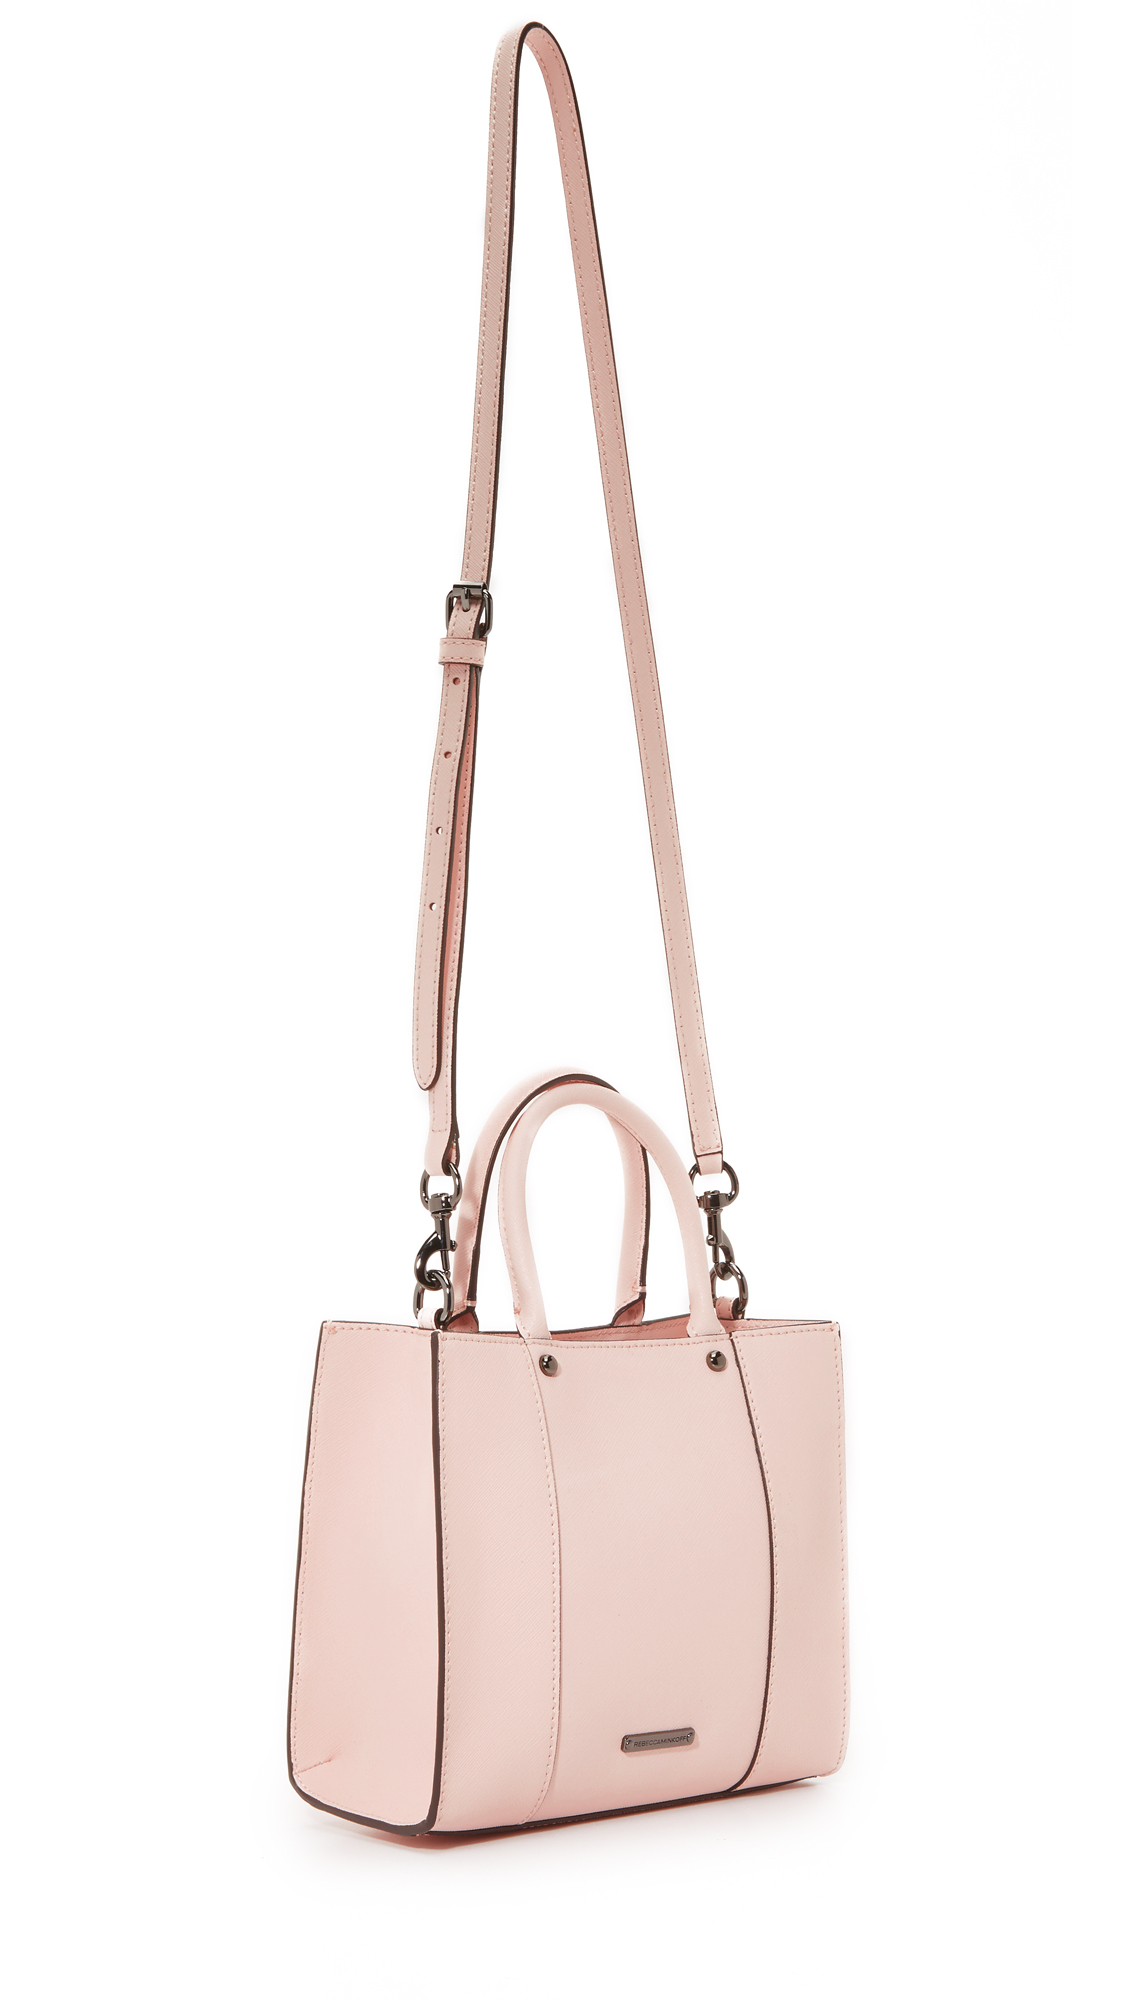 Rebecca Minkoff Leather Mini Mab Tote in Pale Blush (Pink)